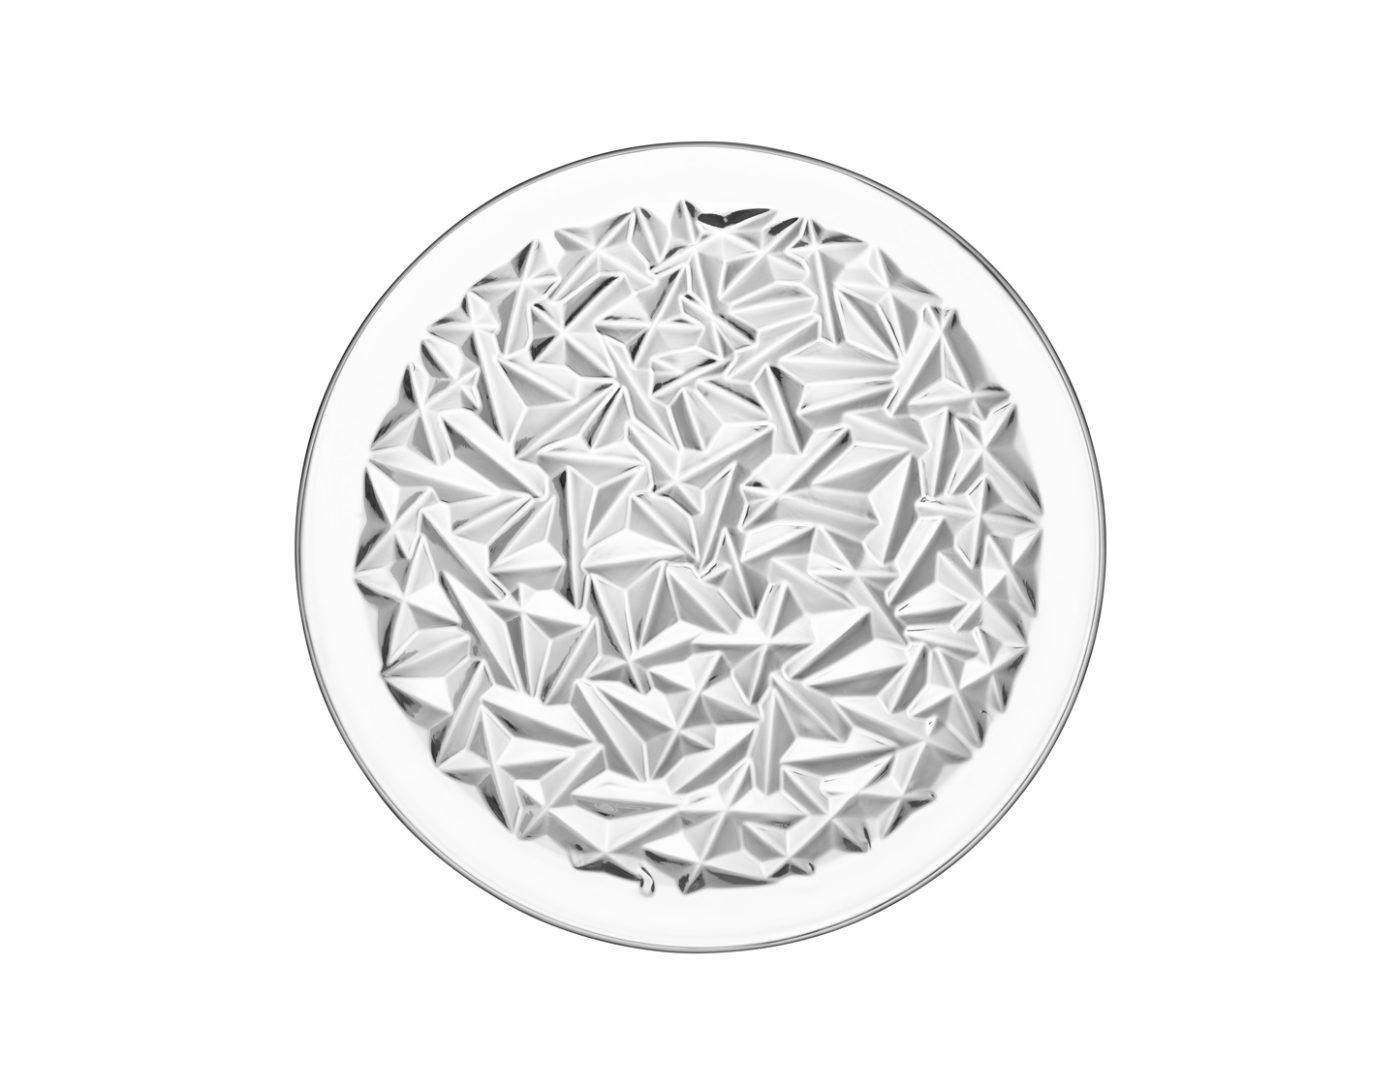 6590152_Carat-Plate-D270mm_WEB-1400x1090